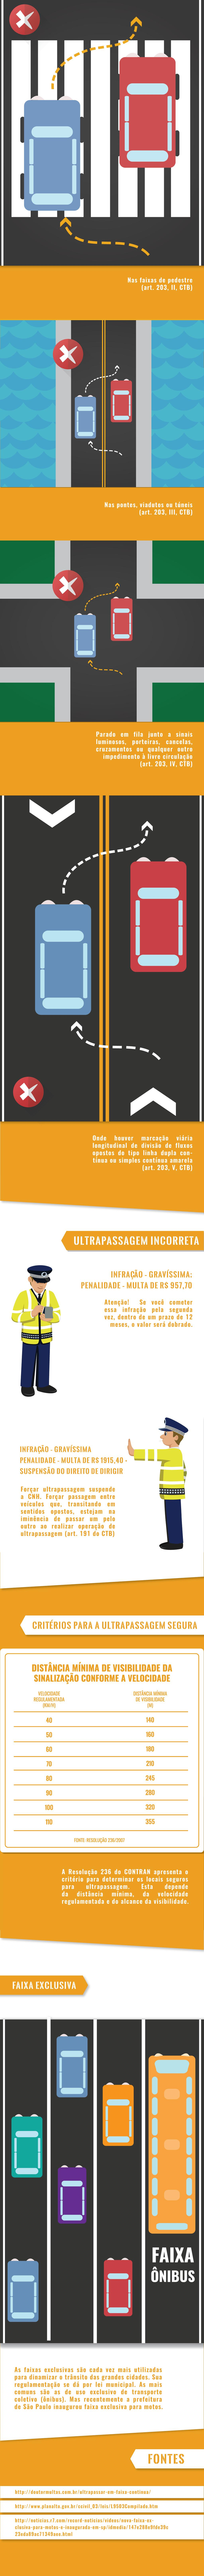 infográfico valor da multa por ultrapassagem